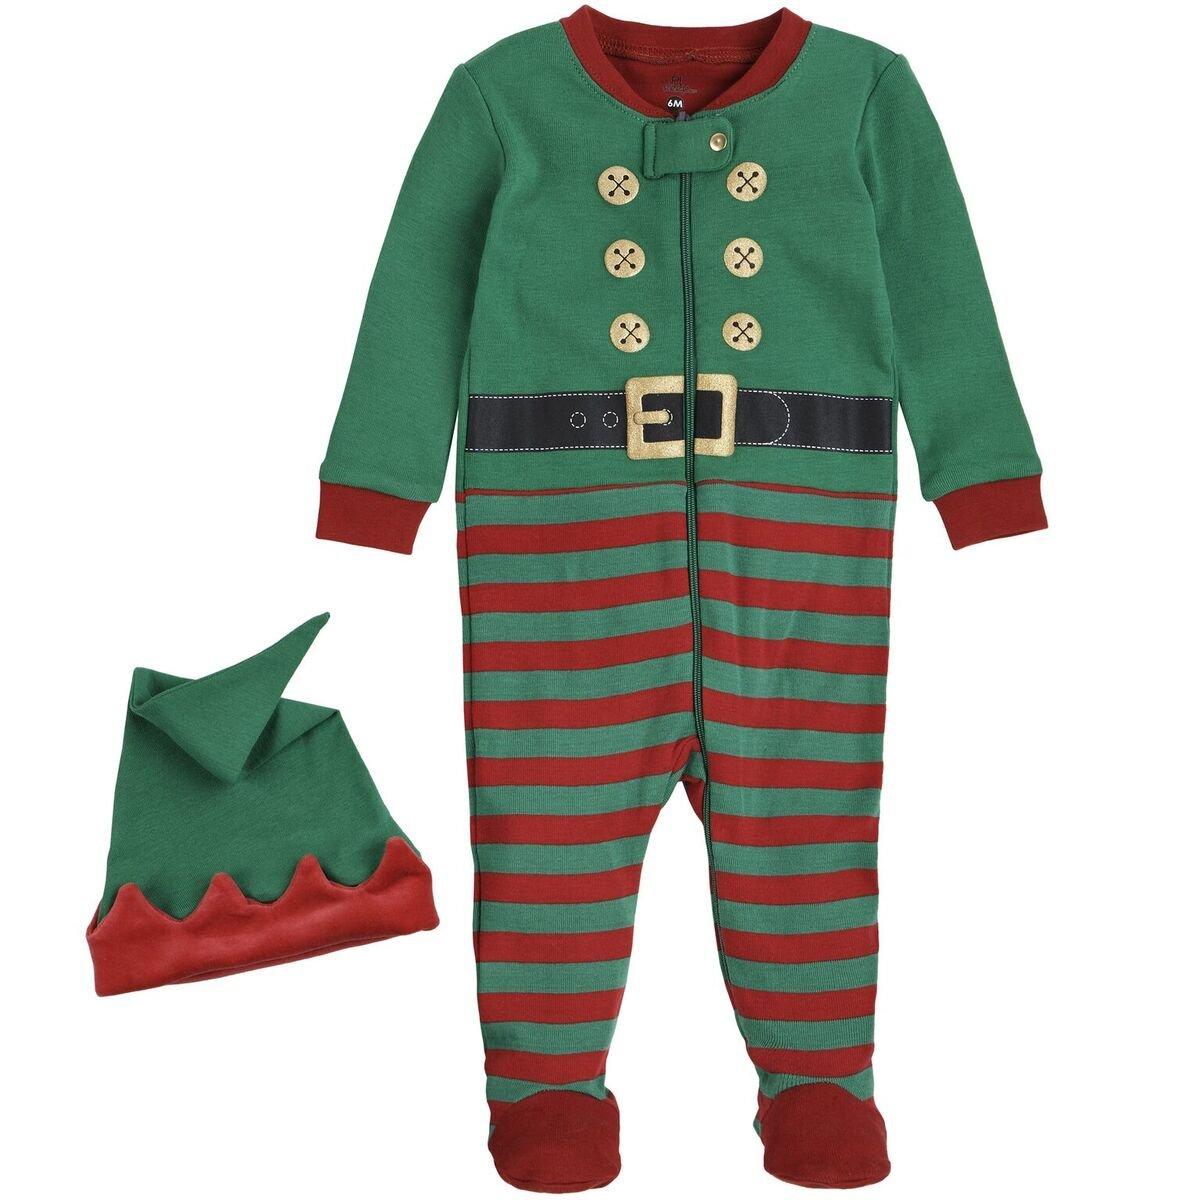 Petit Lem Holiday Baby Sleeper Pyjama & Hat In Knit, Multi, 3M by Petit Lem